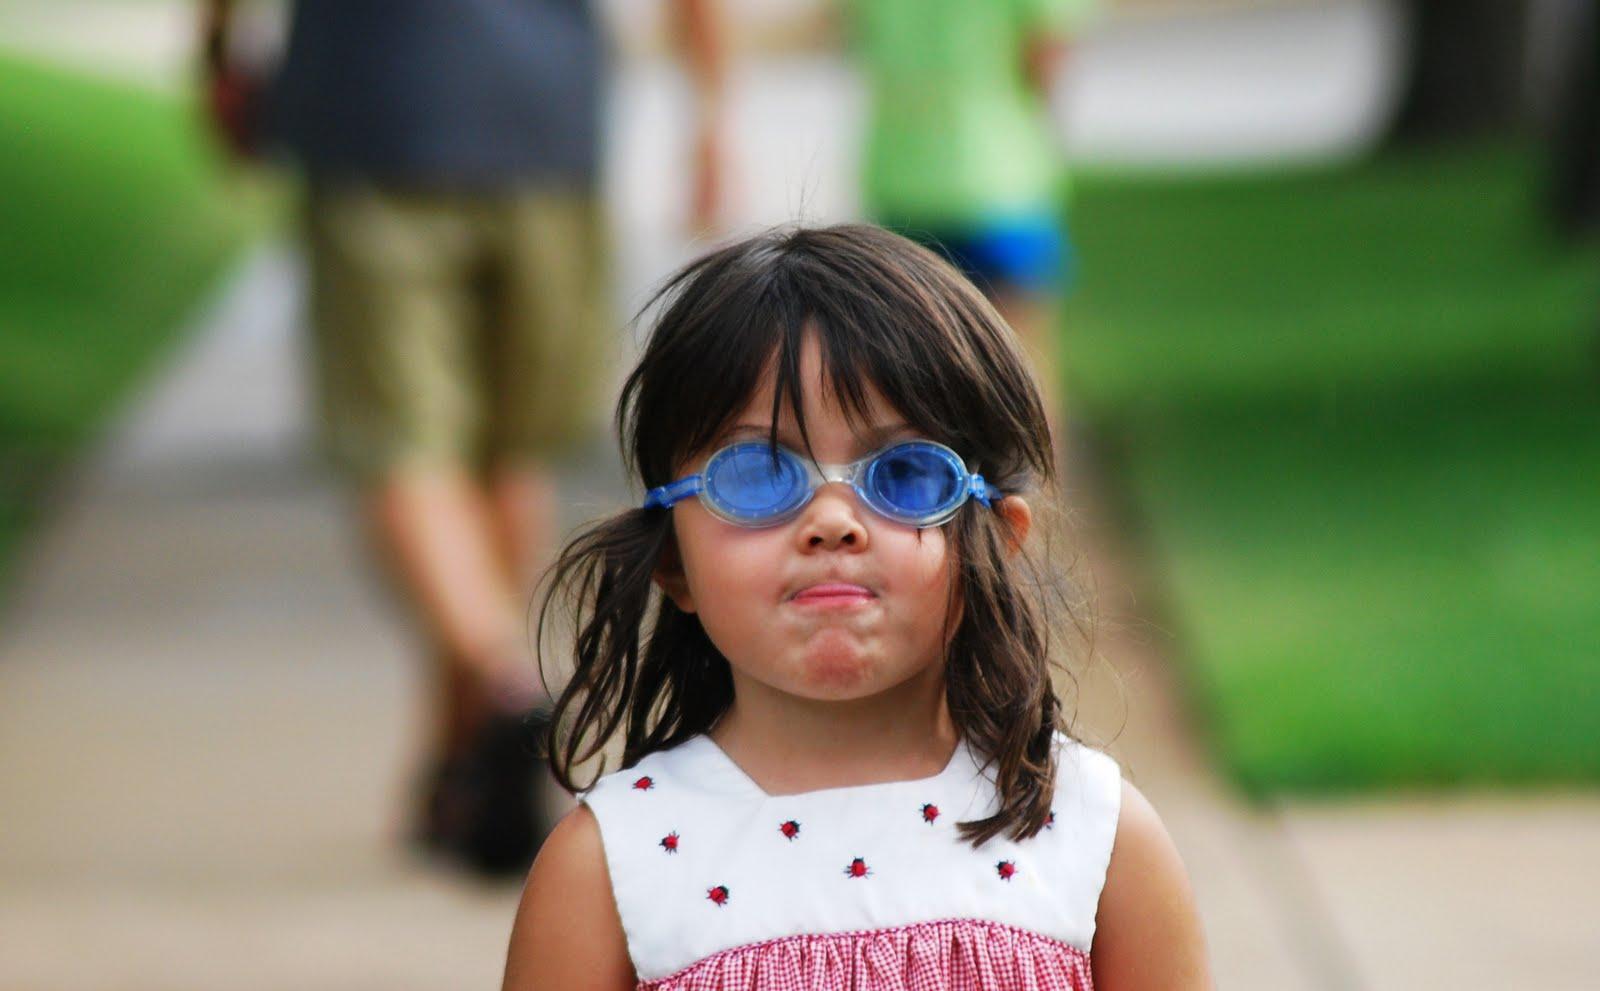 Oklahoma Photography | Blue Goggles